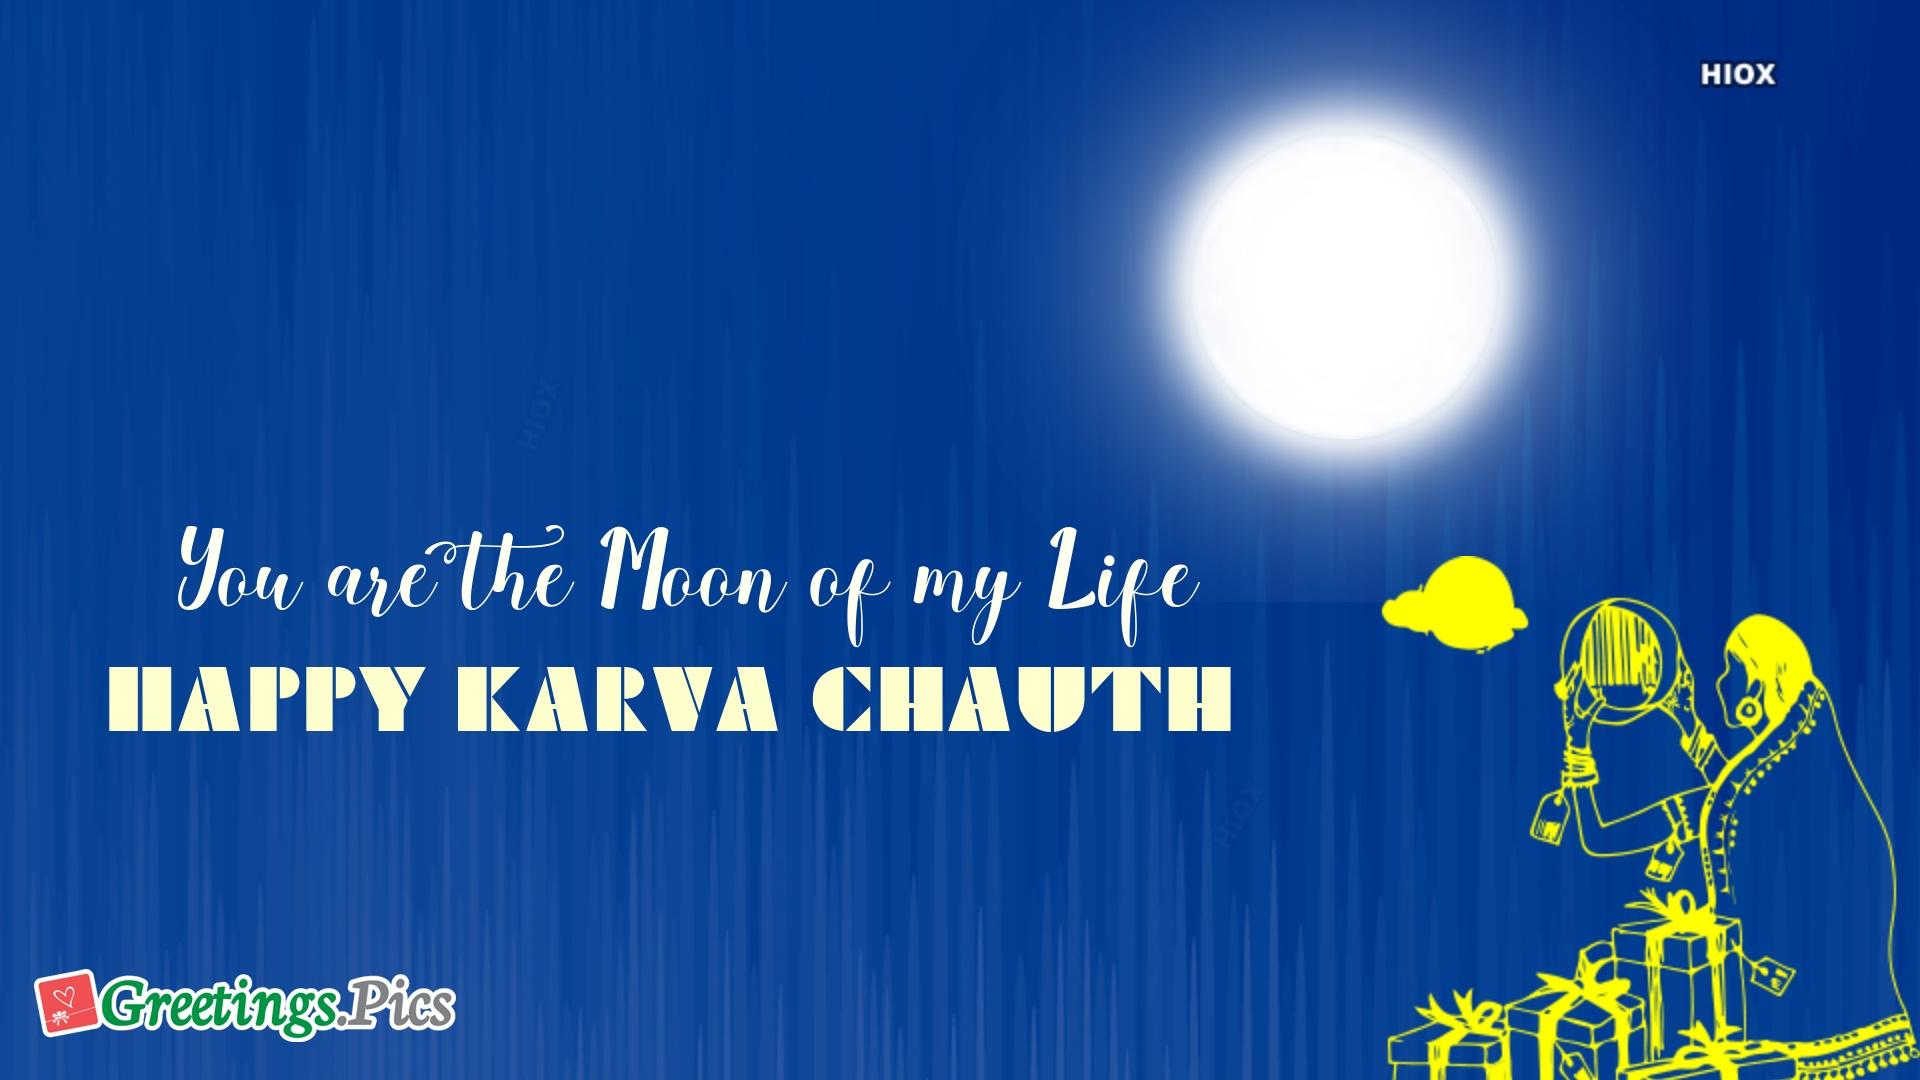 Happy Karva Chauth Quotes